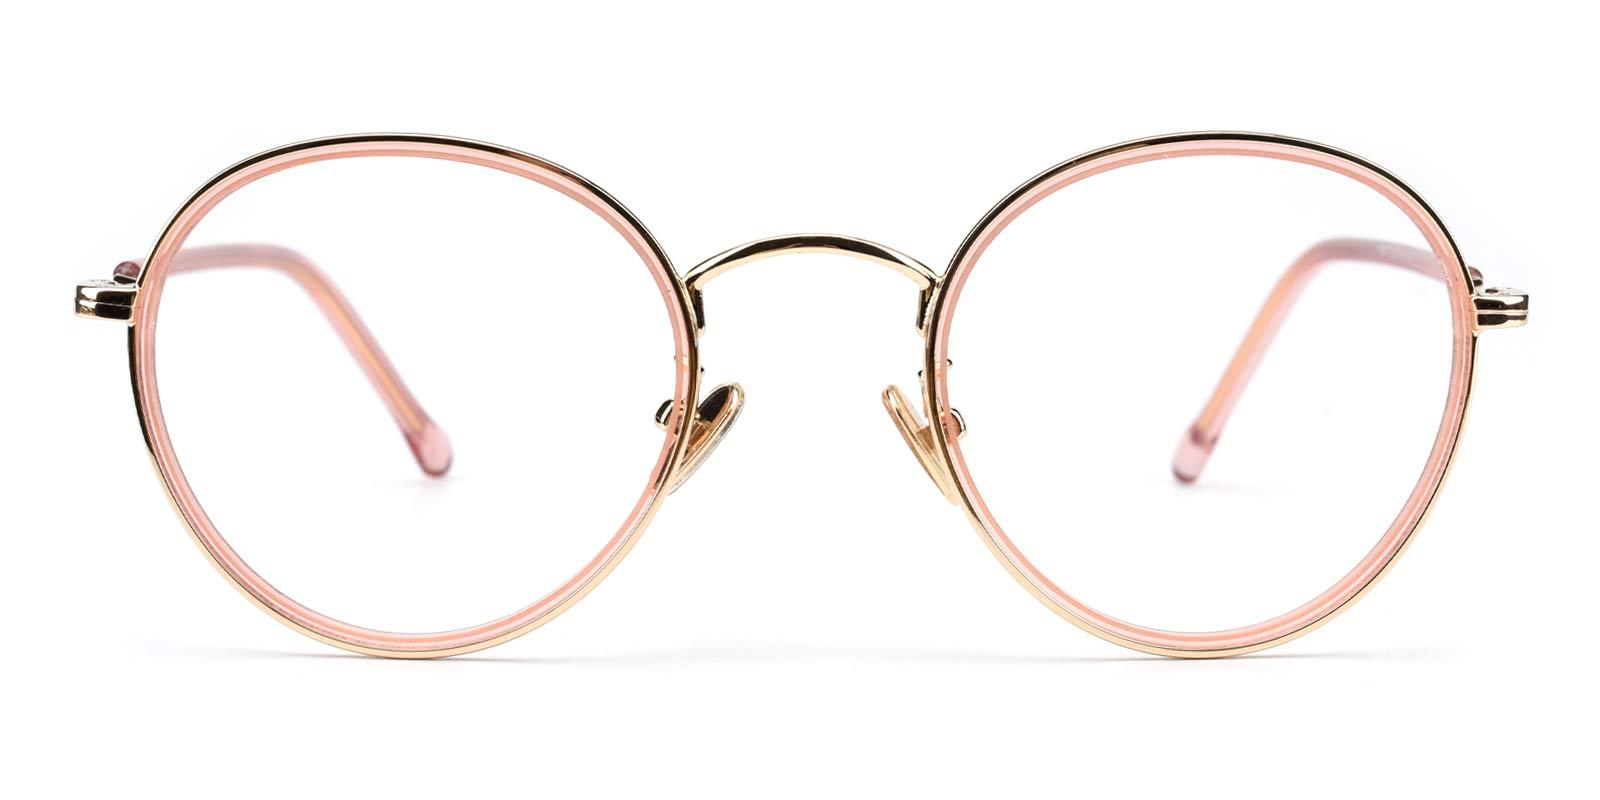 Jenny-Pink-Round-Combination-Eyeglasses-detail